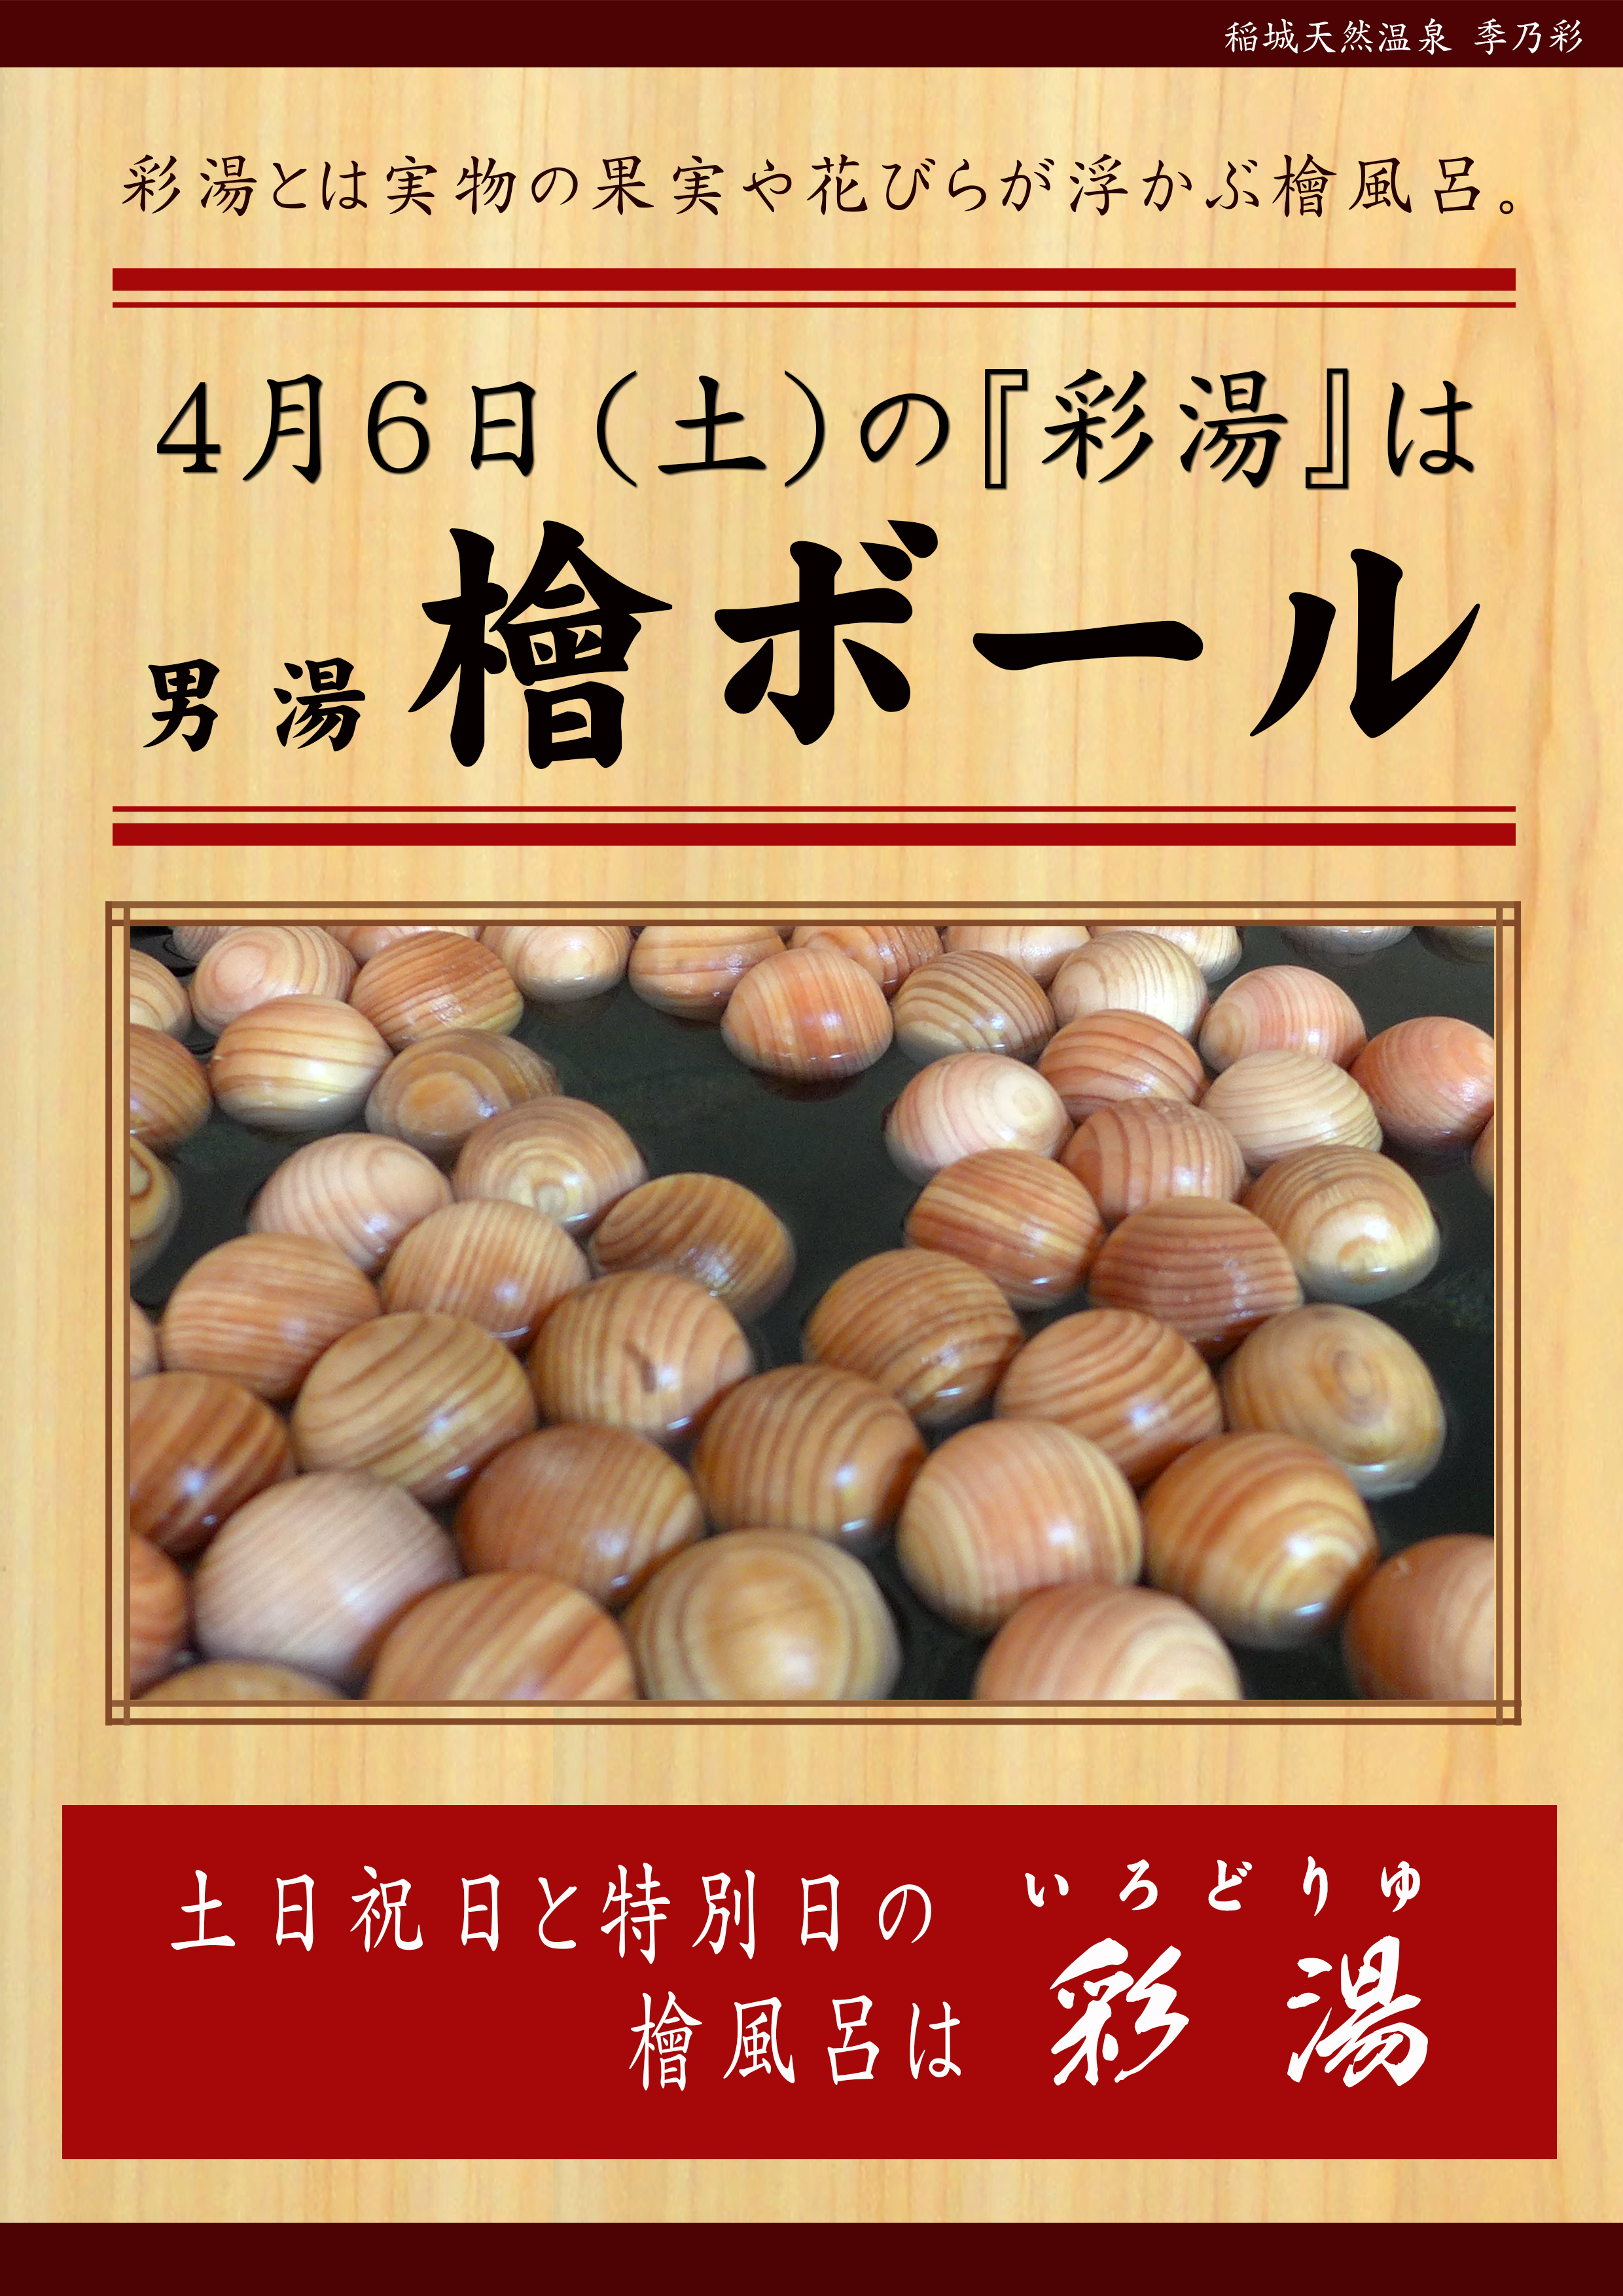 20190406POP イベント 彩湯 男湯 檜ボール